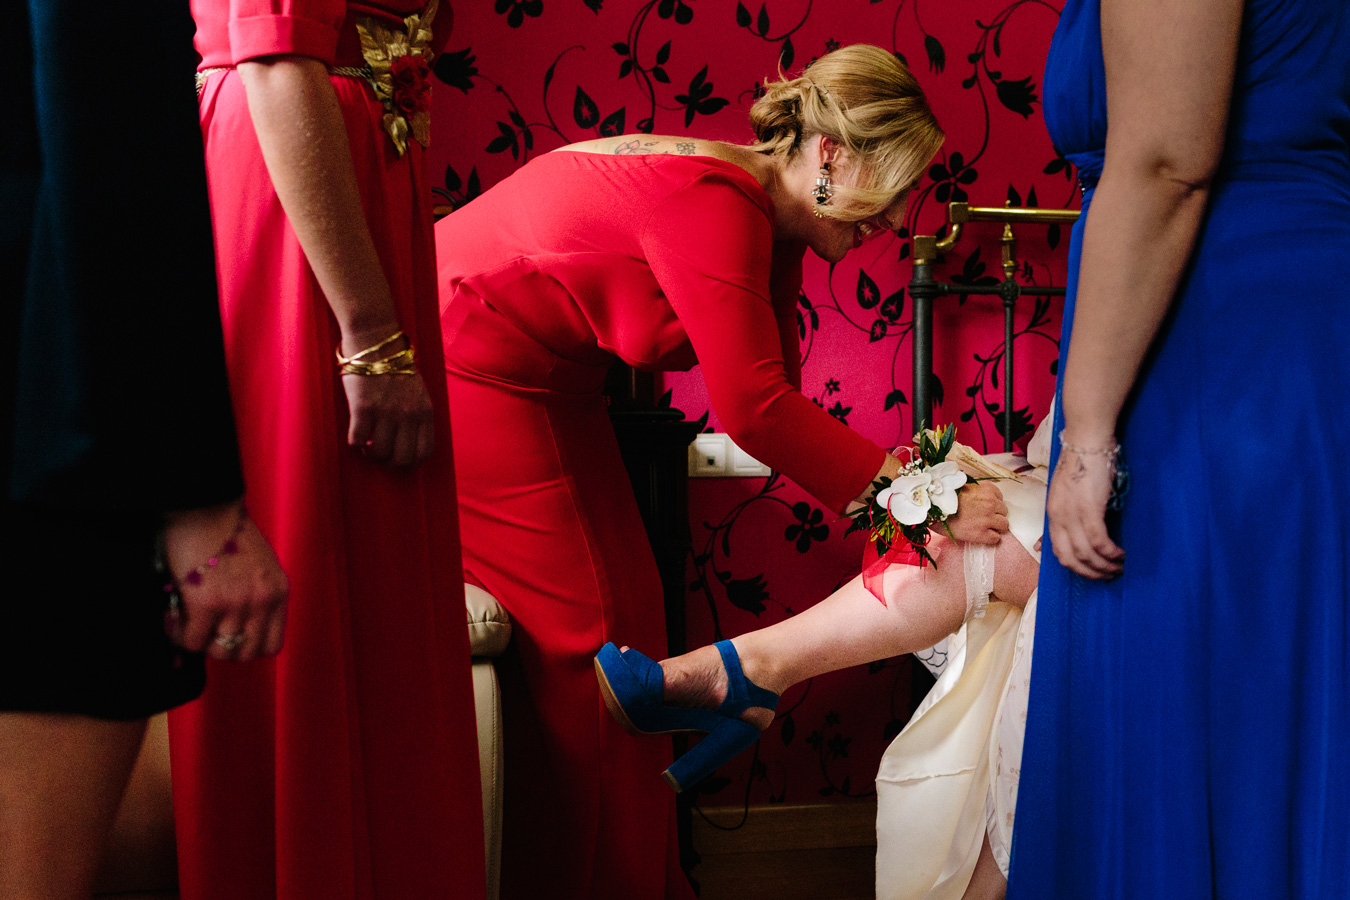 fotografo de bodas granada malaga